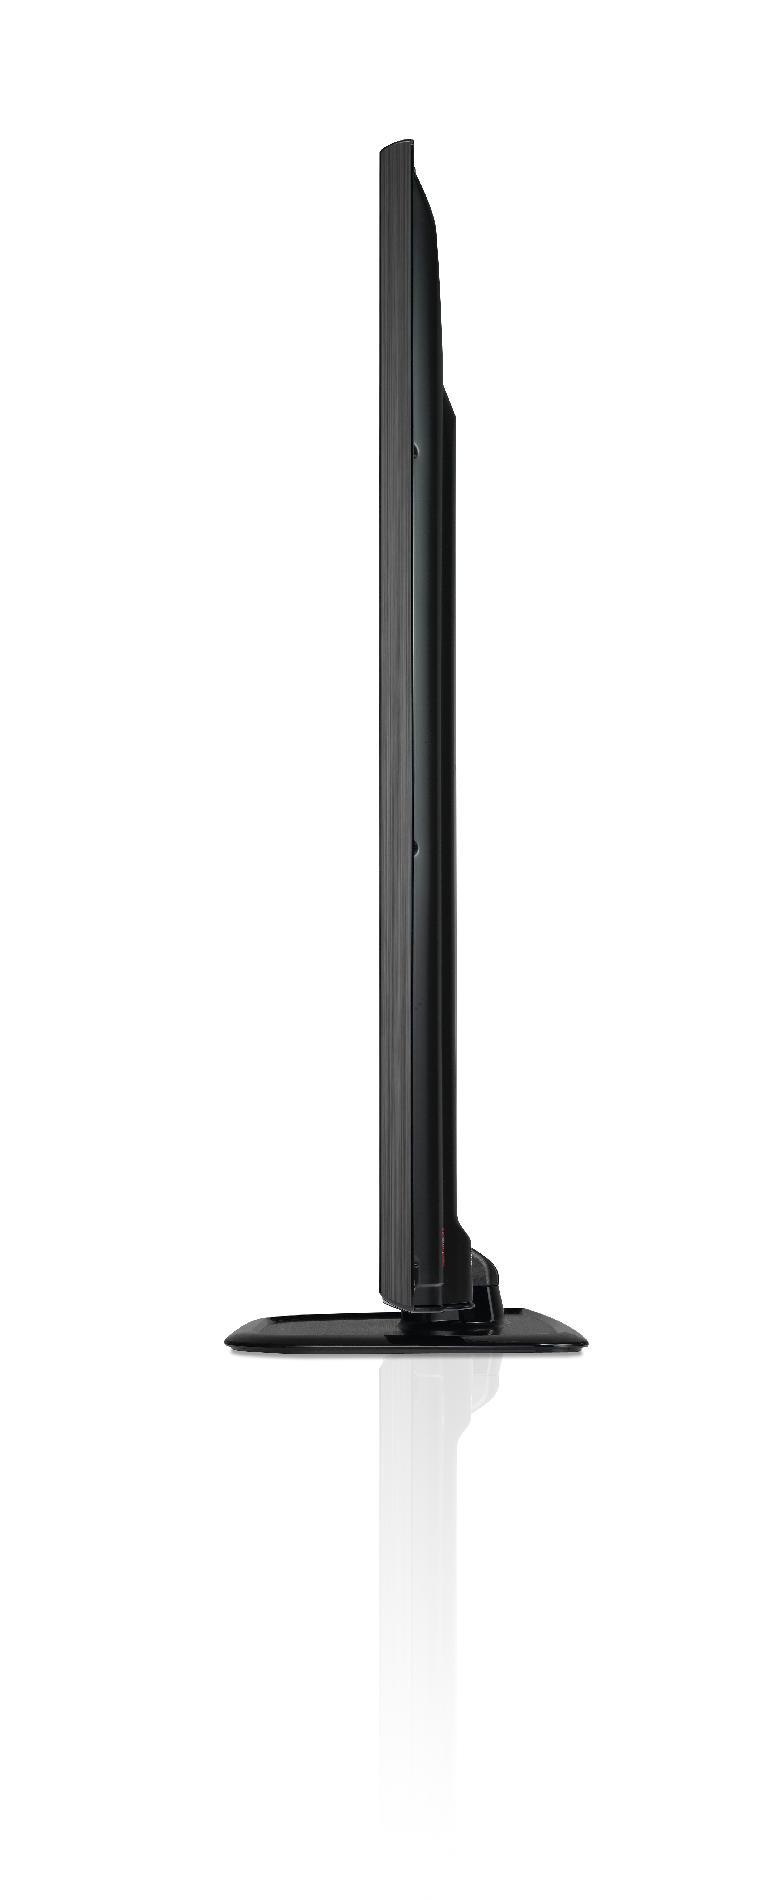 "LG 60"" Class 1080p 600Hz Plasma HDTV - 60PN6500"